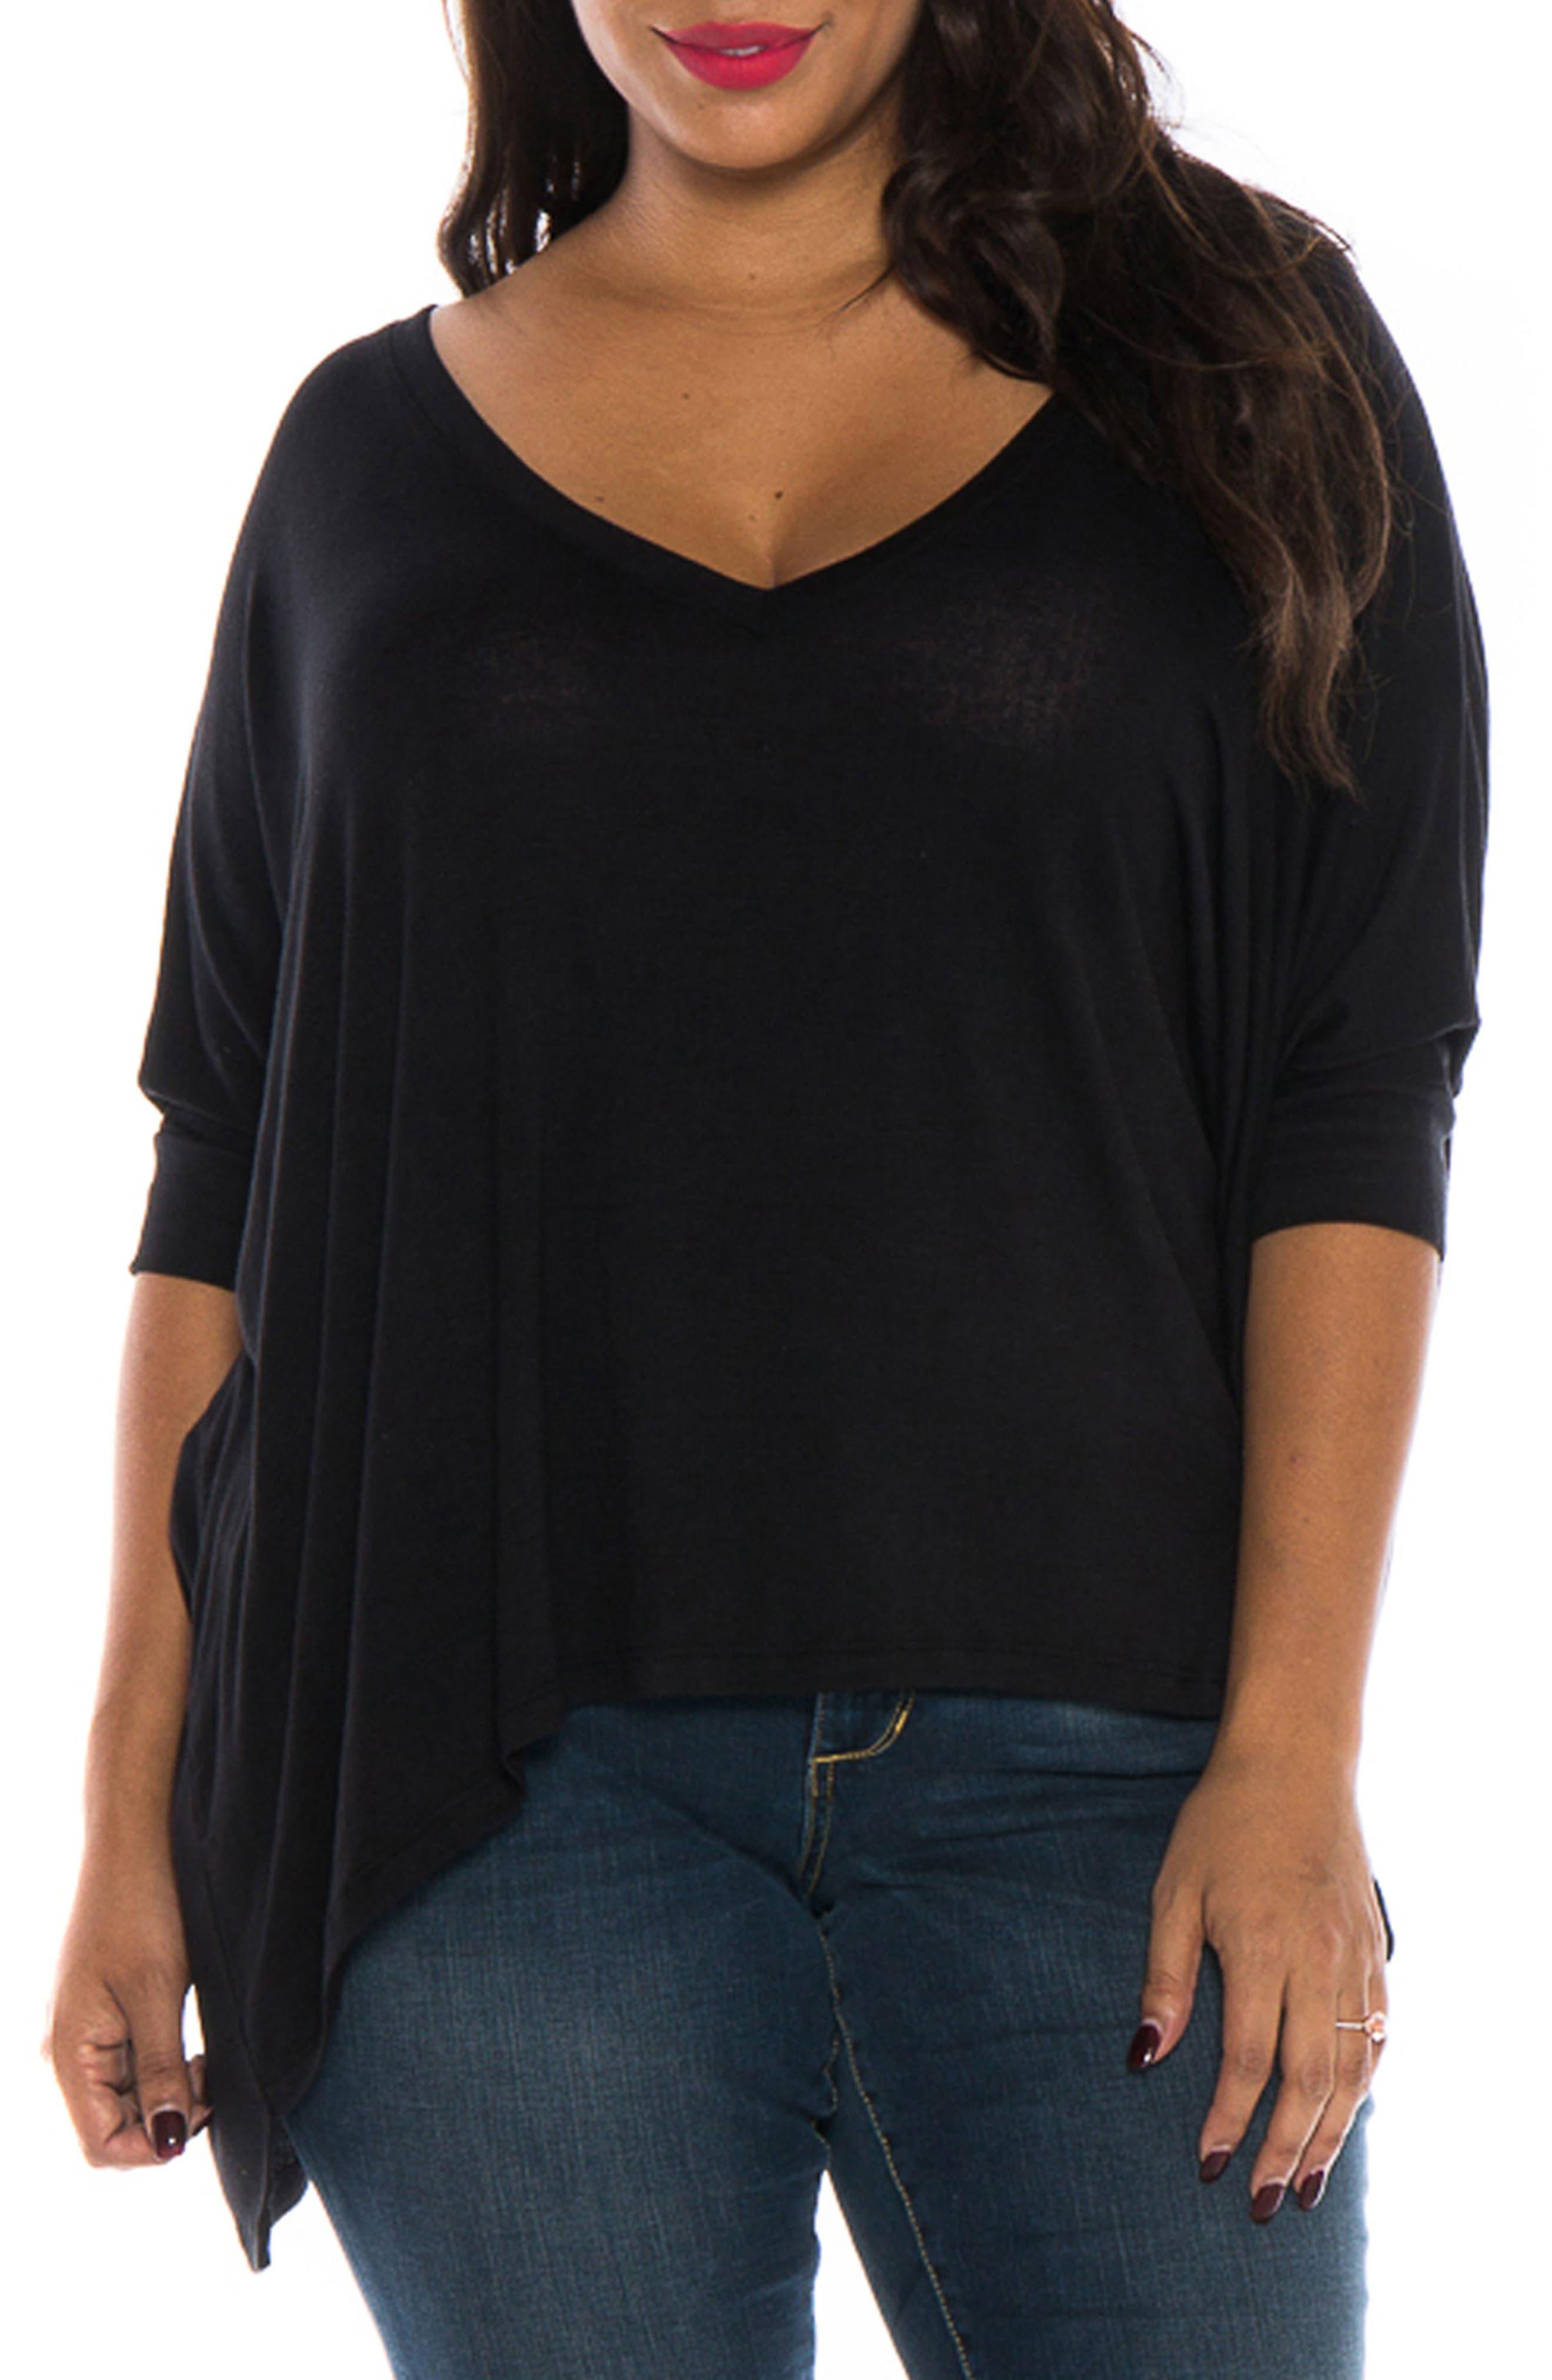 Alternate Image 1 Selected - SLINK Jeans V-Neck Tee (Plus Size)